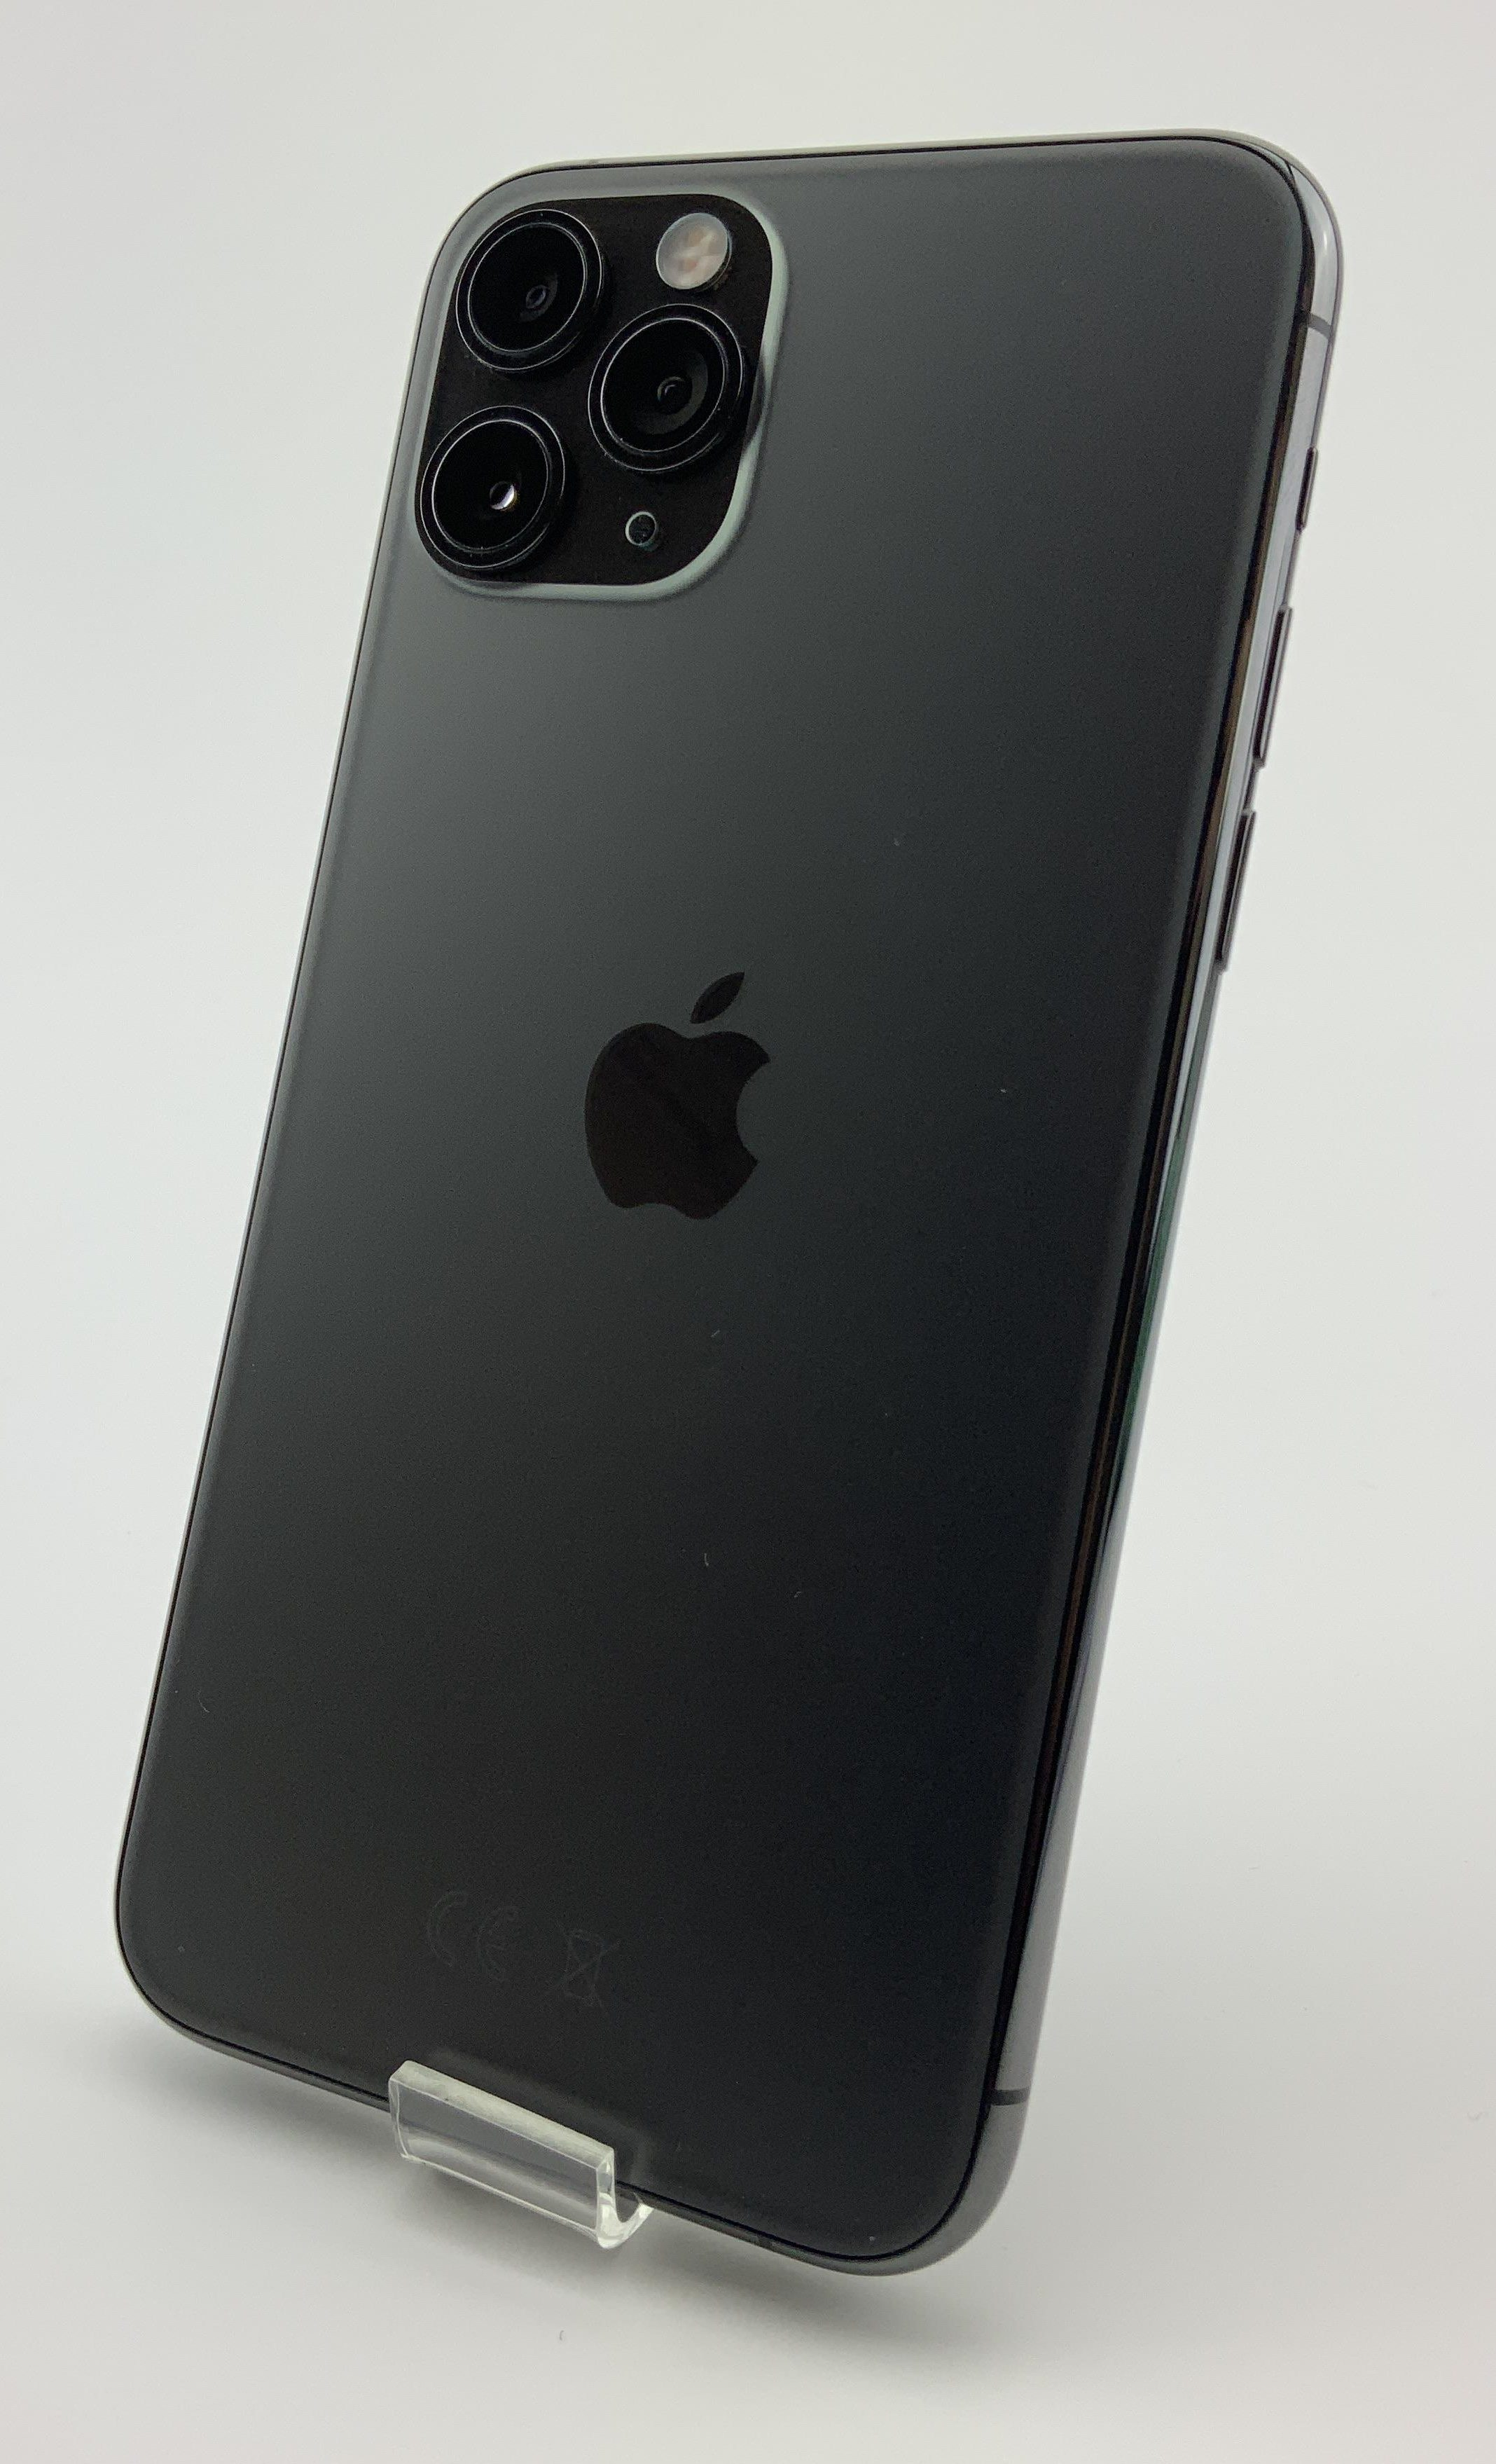 iPhone 11 Pro 64GB, 64GB, Space Gray, obraz 2